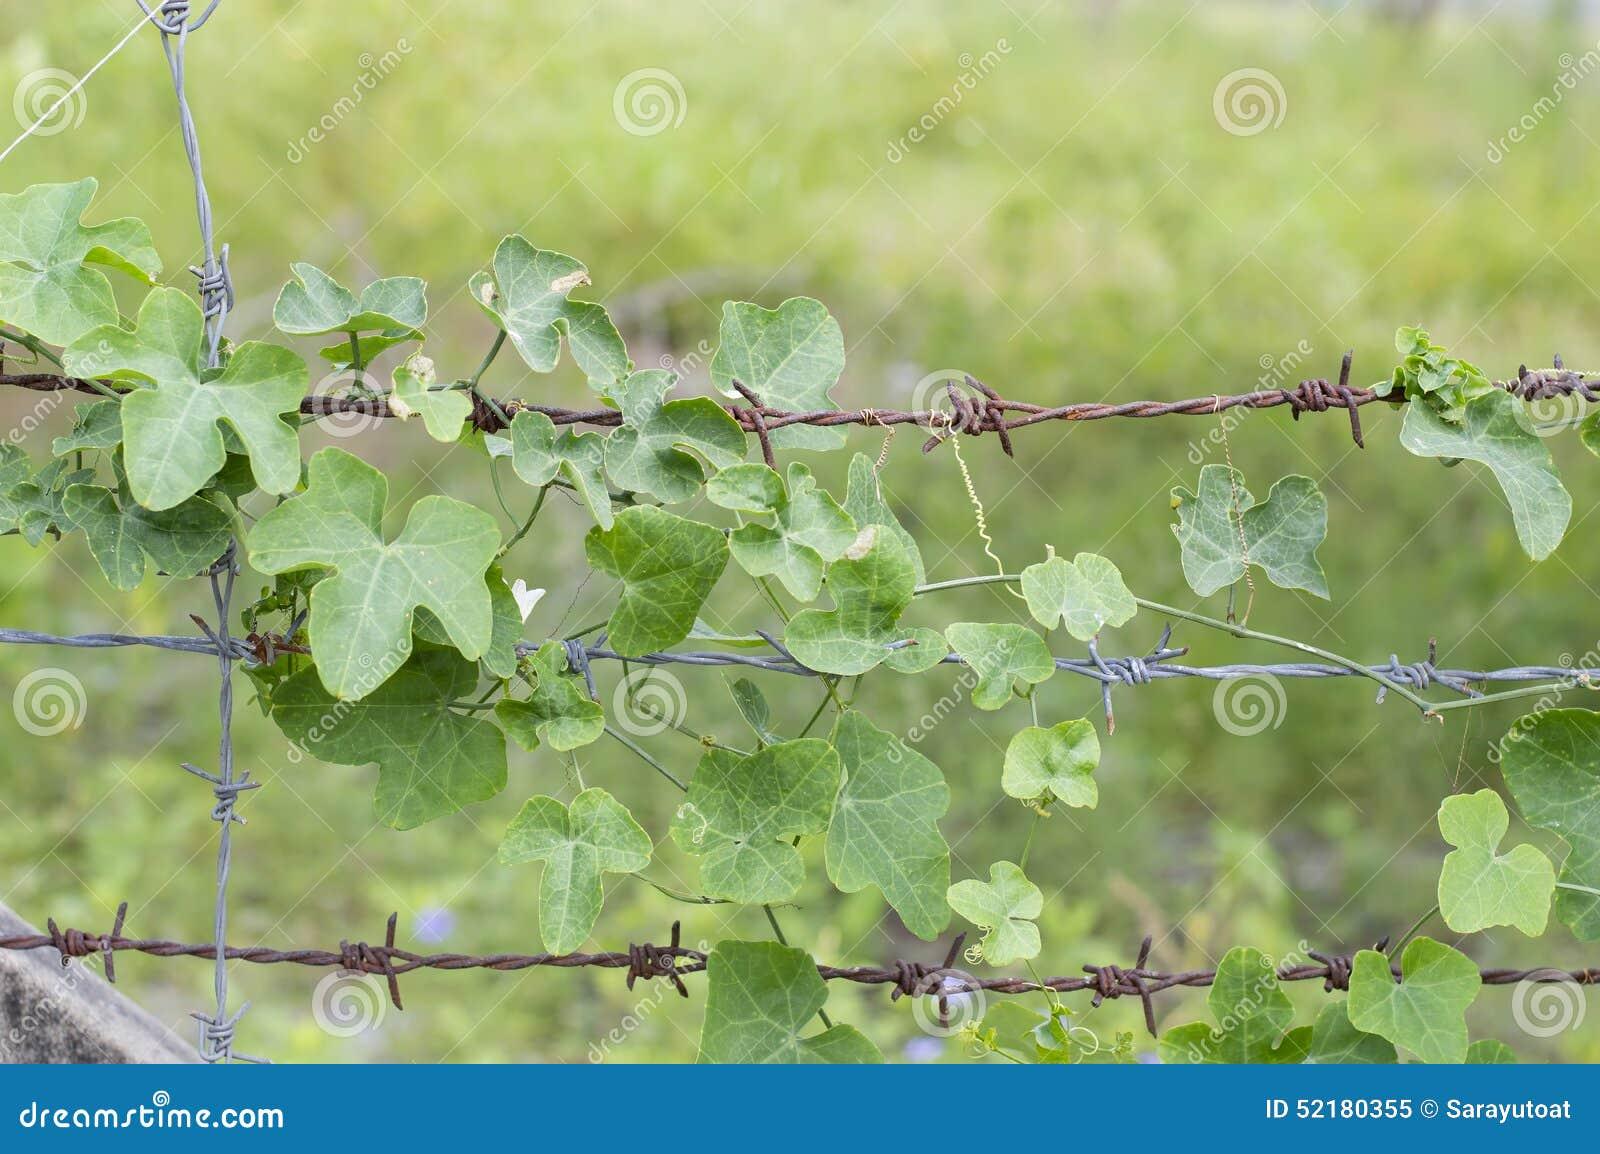 Treetop Gourd ivy leaf on barbed wir